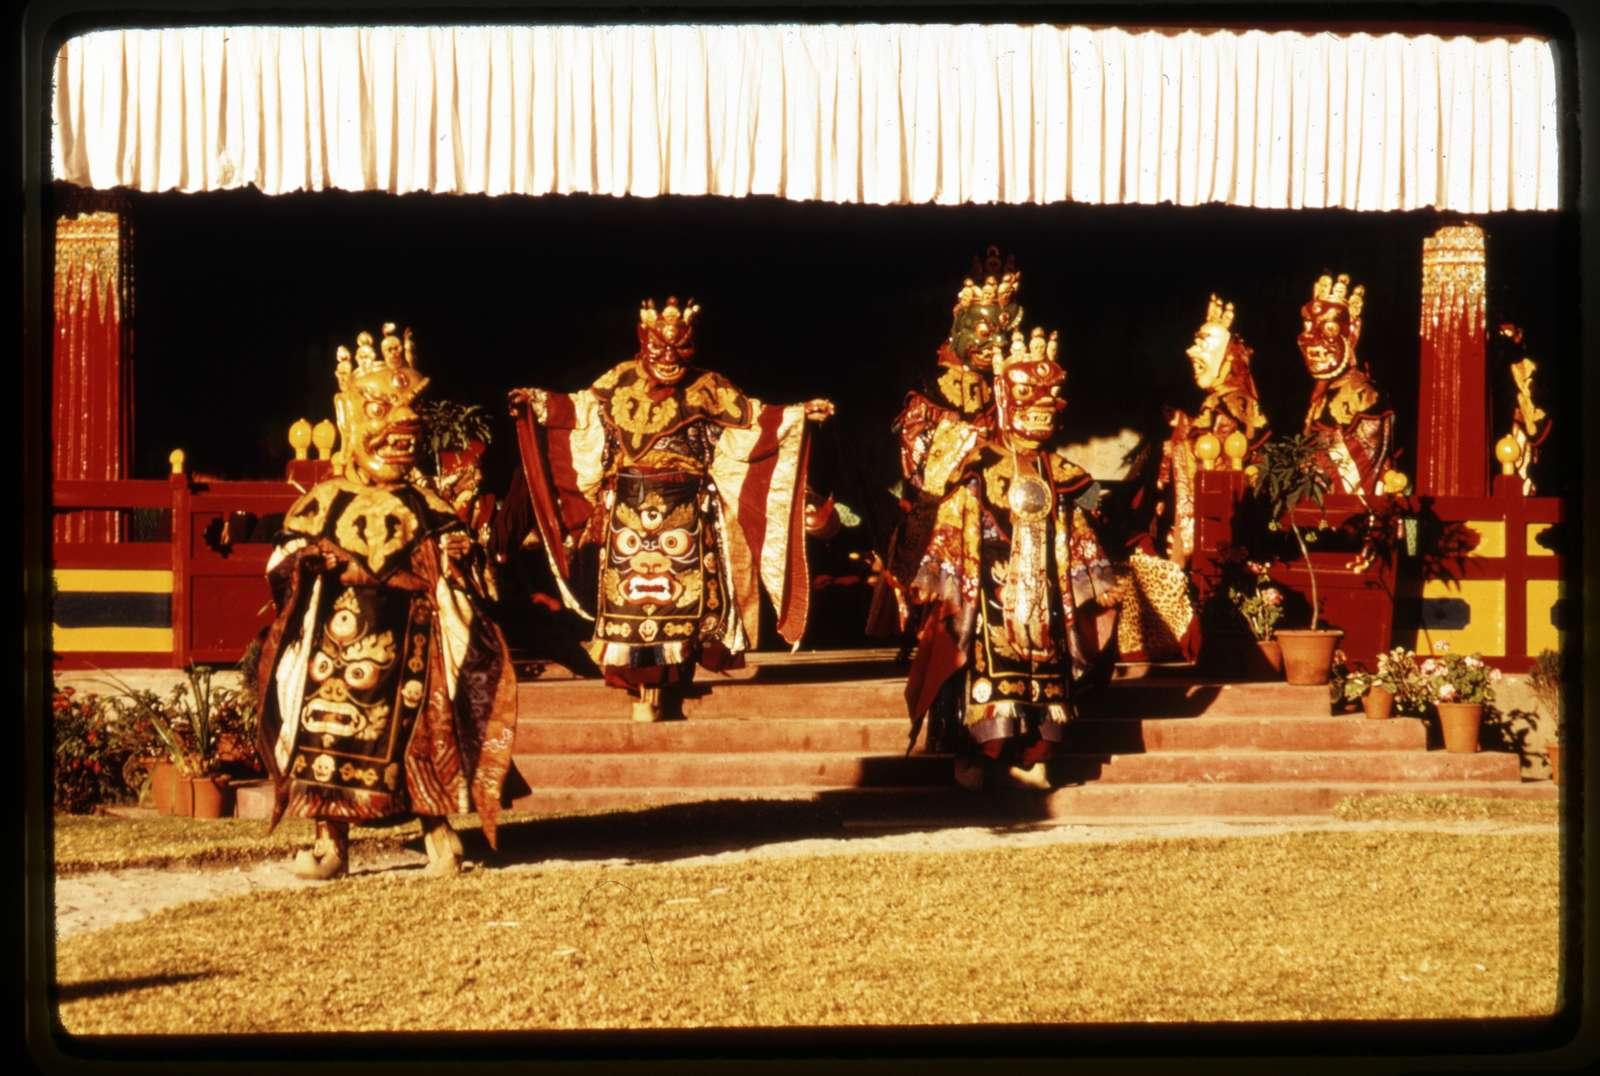 [Mahakala masked dancers entering the New Year's ceremony, Gangtok, Sikkim]